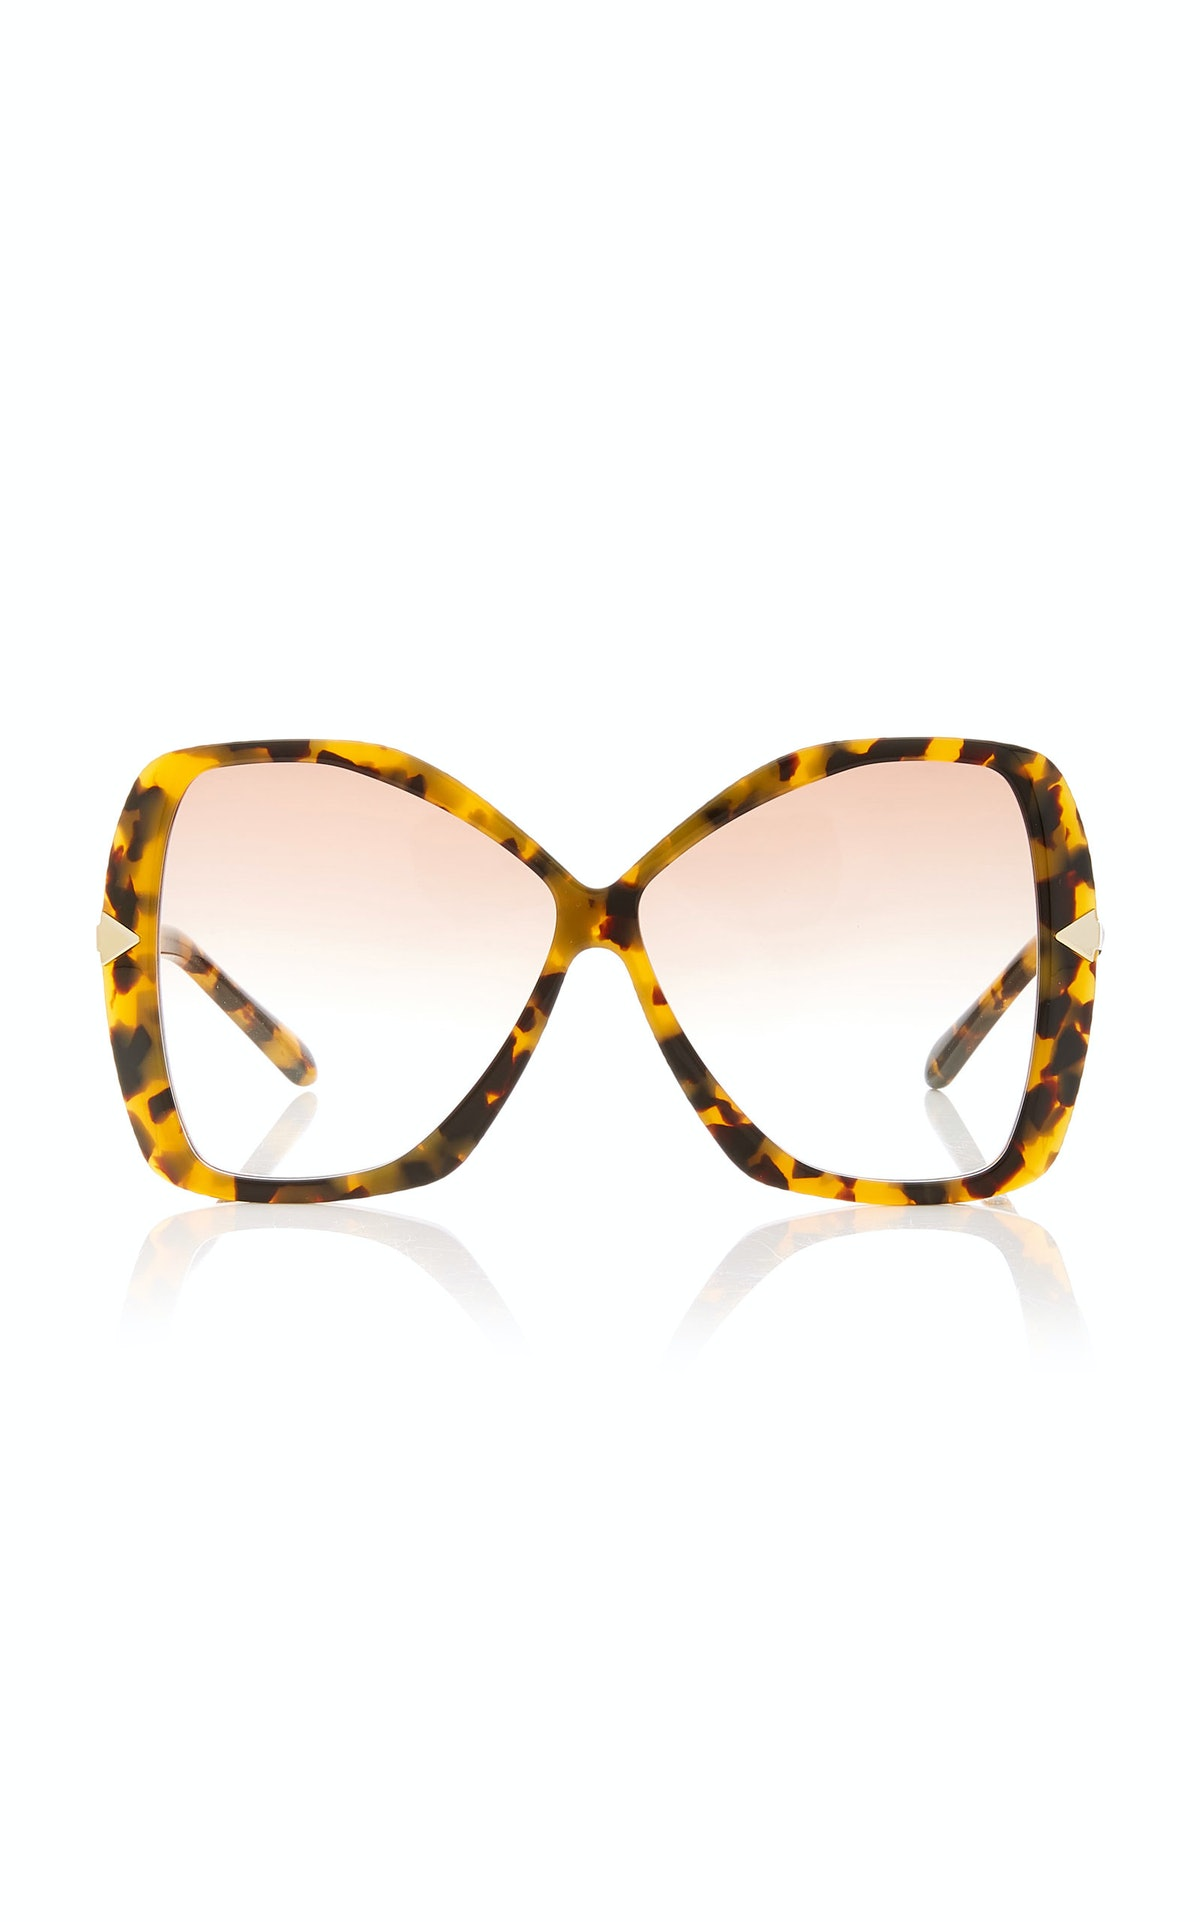 Mary Oversized Acetate Sunglasses